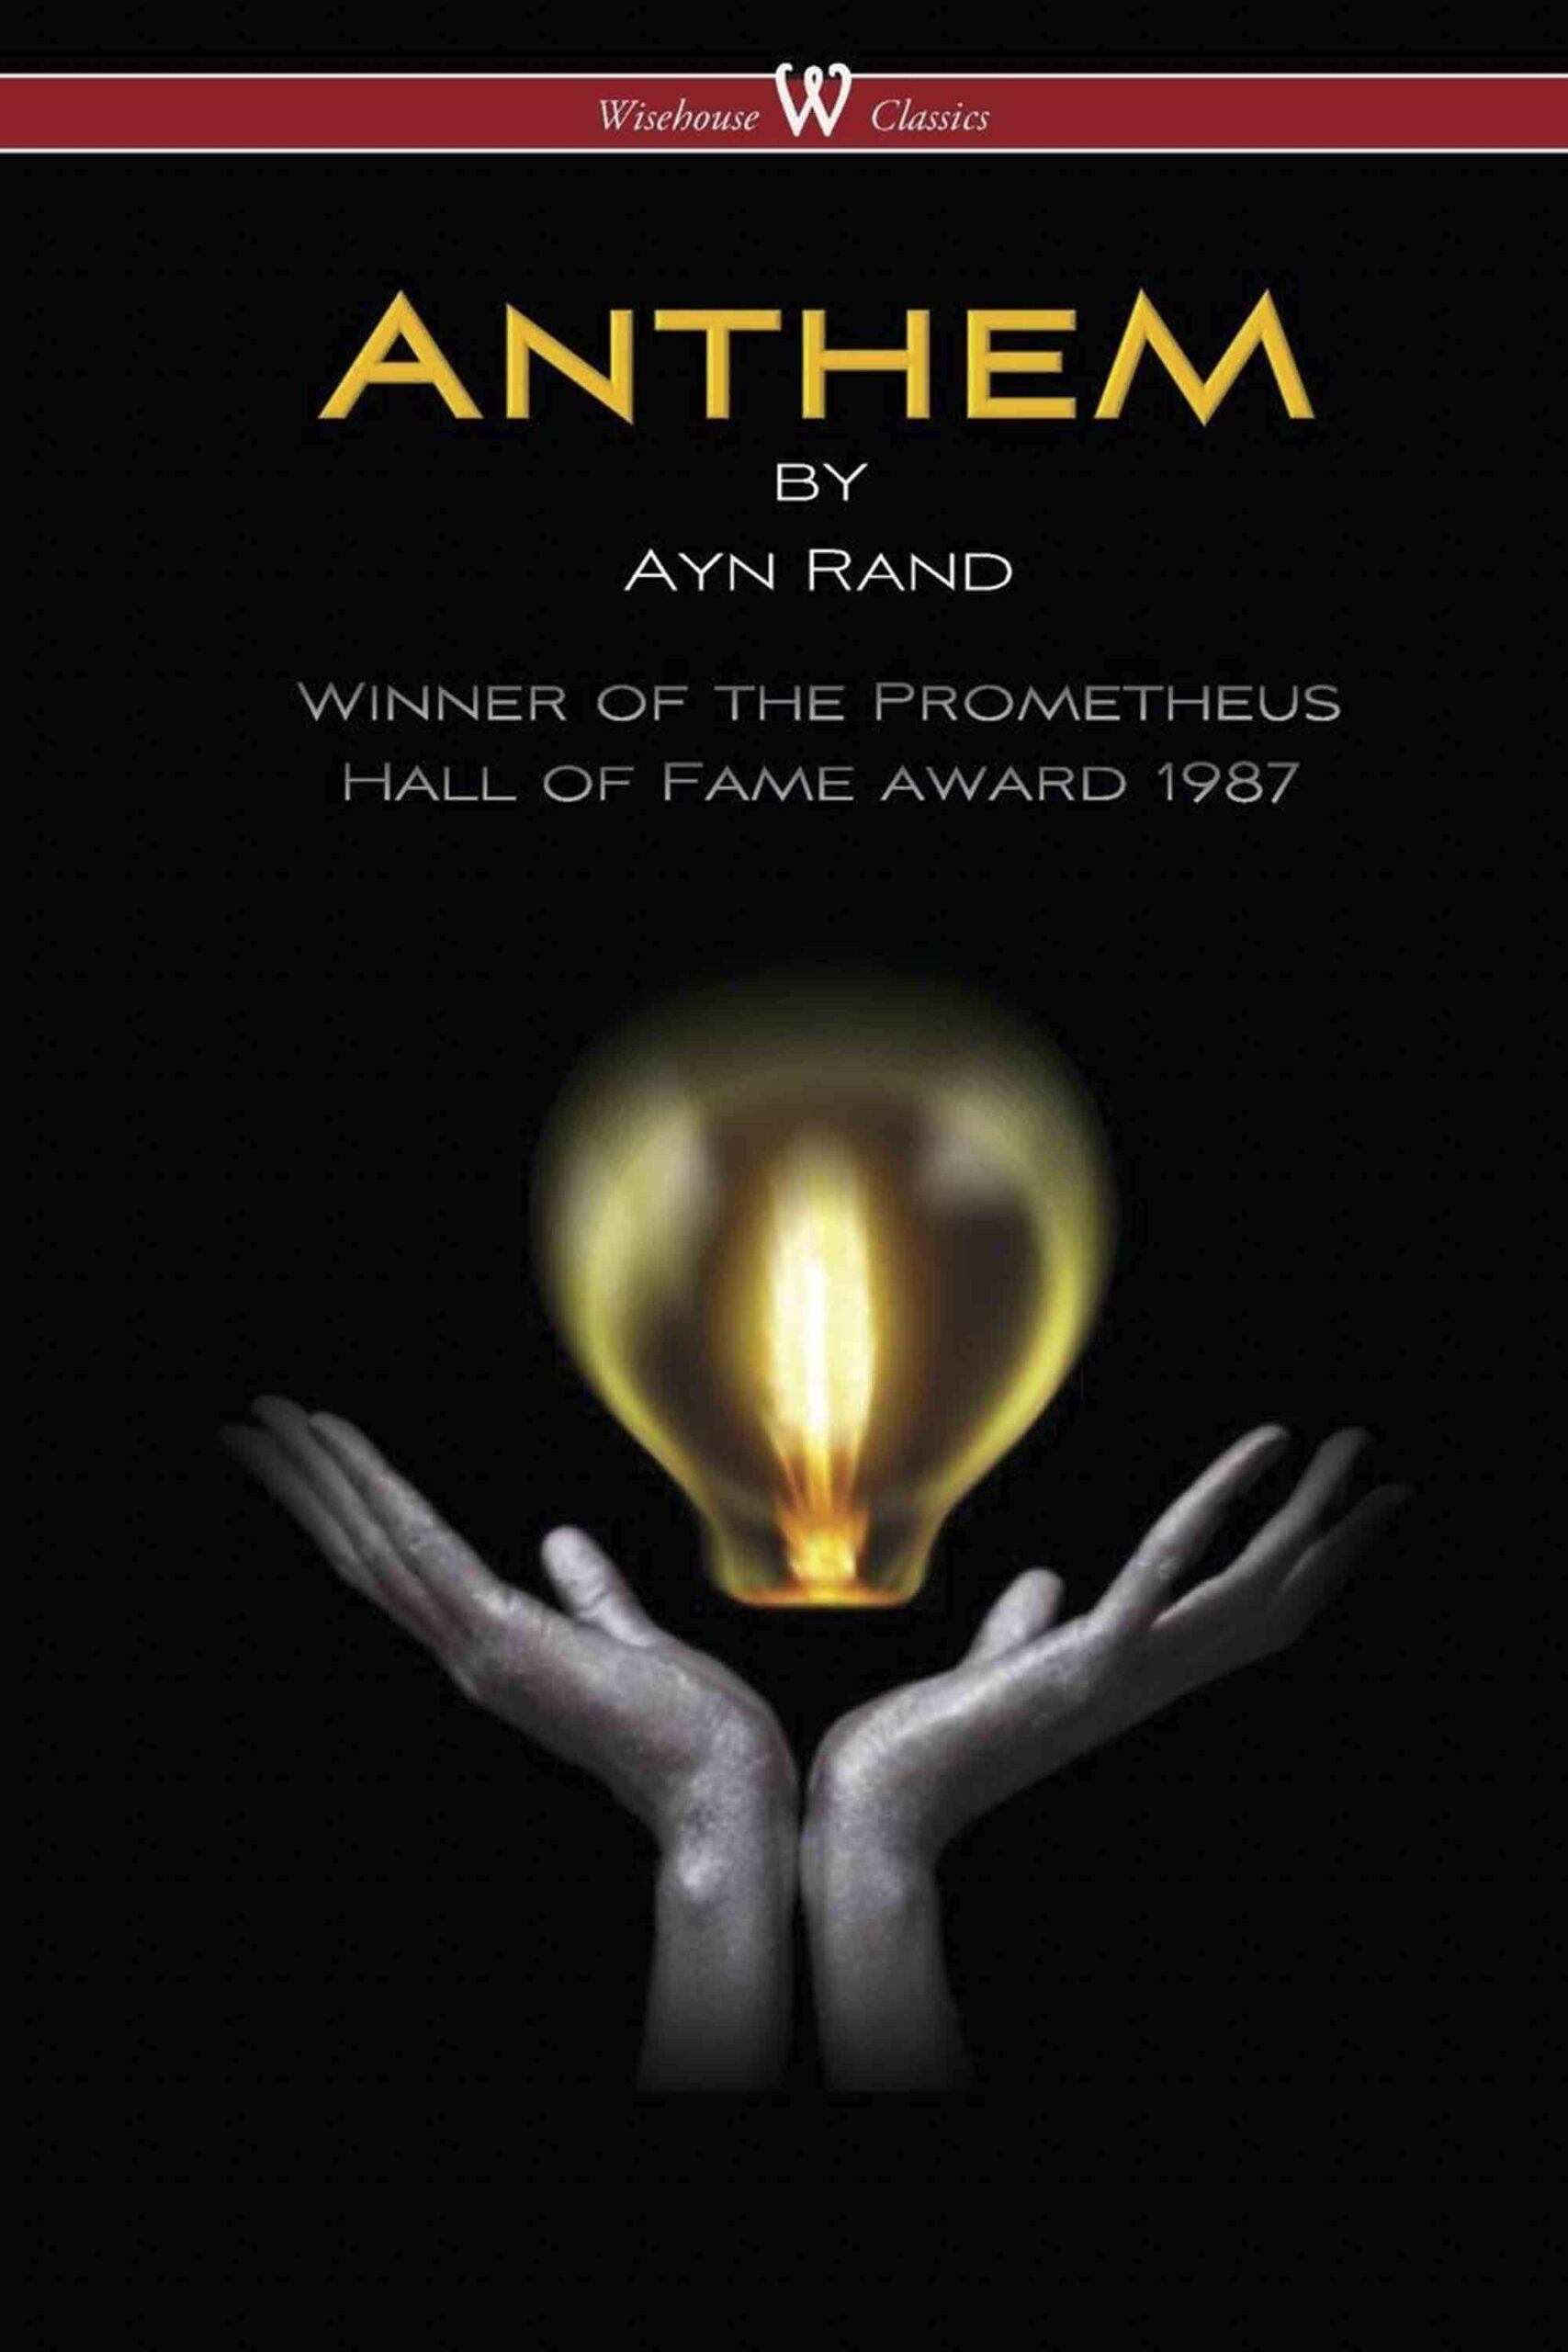 ANTHEM (Wisehouse Classics Edition)